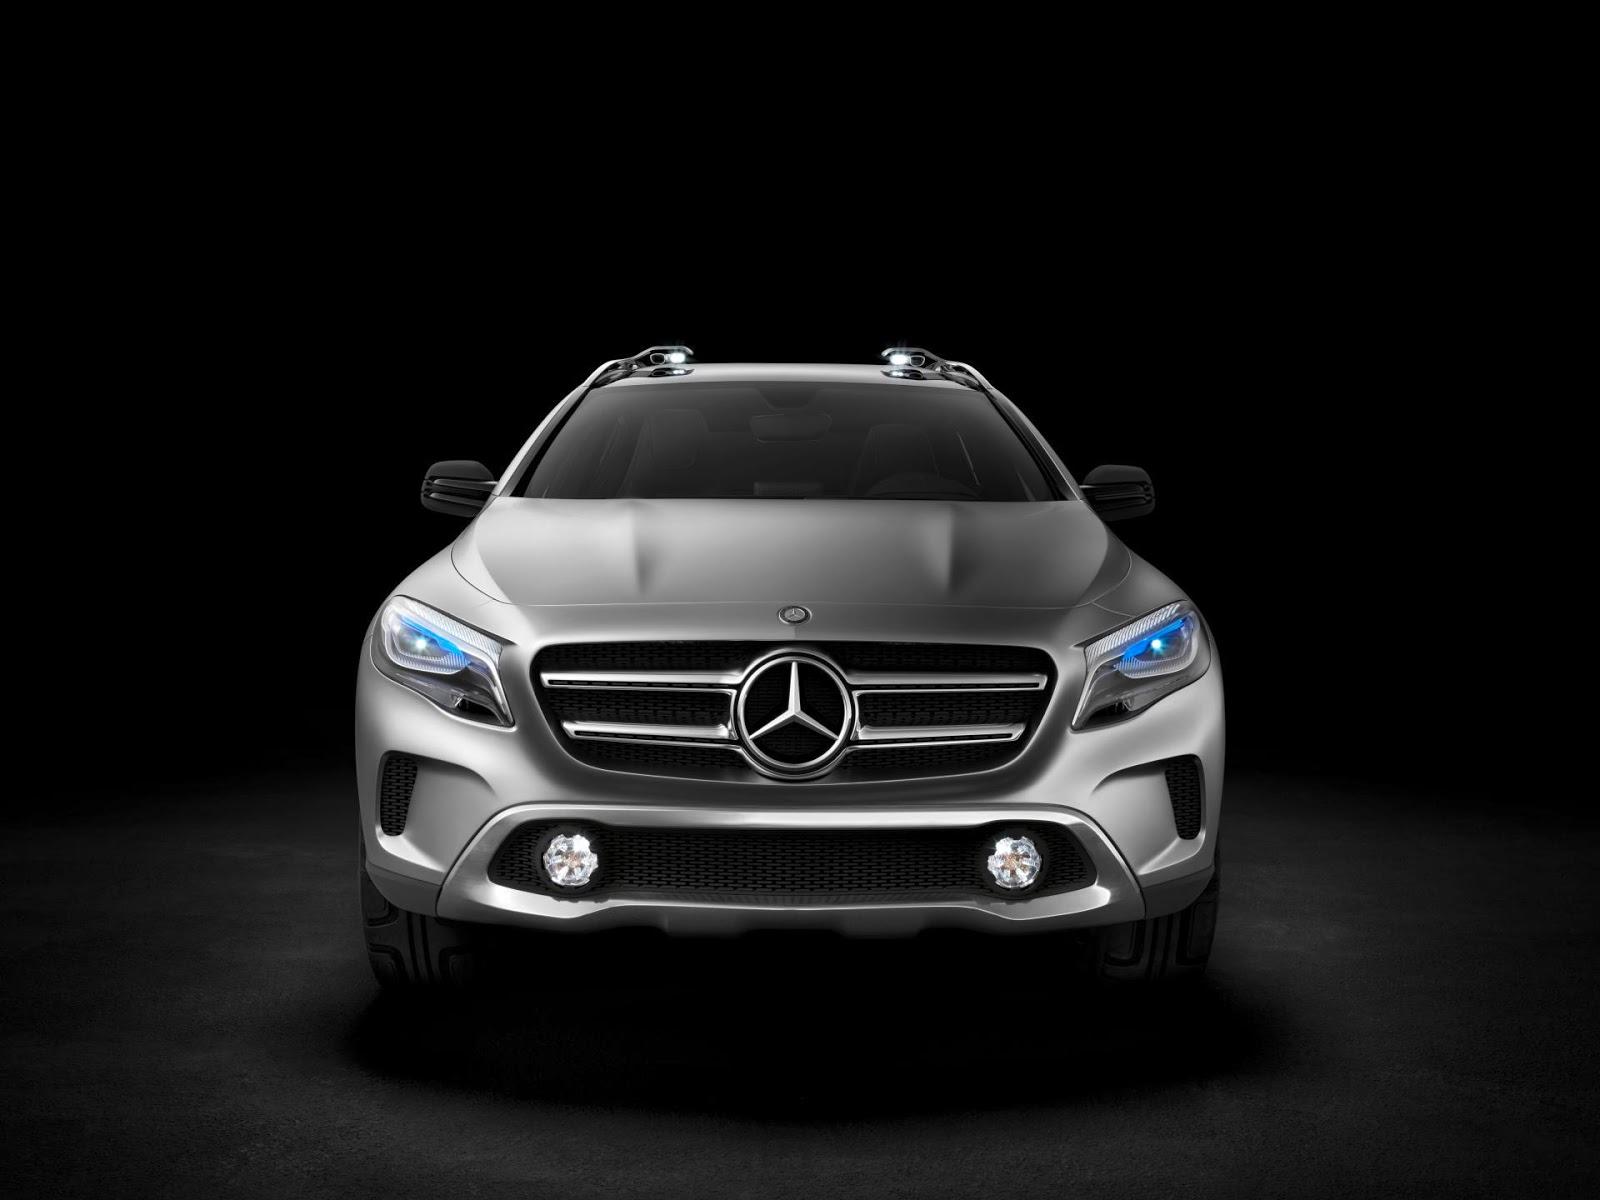 Mercedes benz gla concept 2013 hottest car wallpapers for 2013 mercedes benz gla